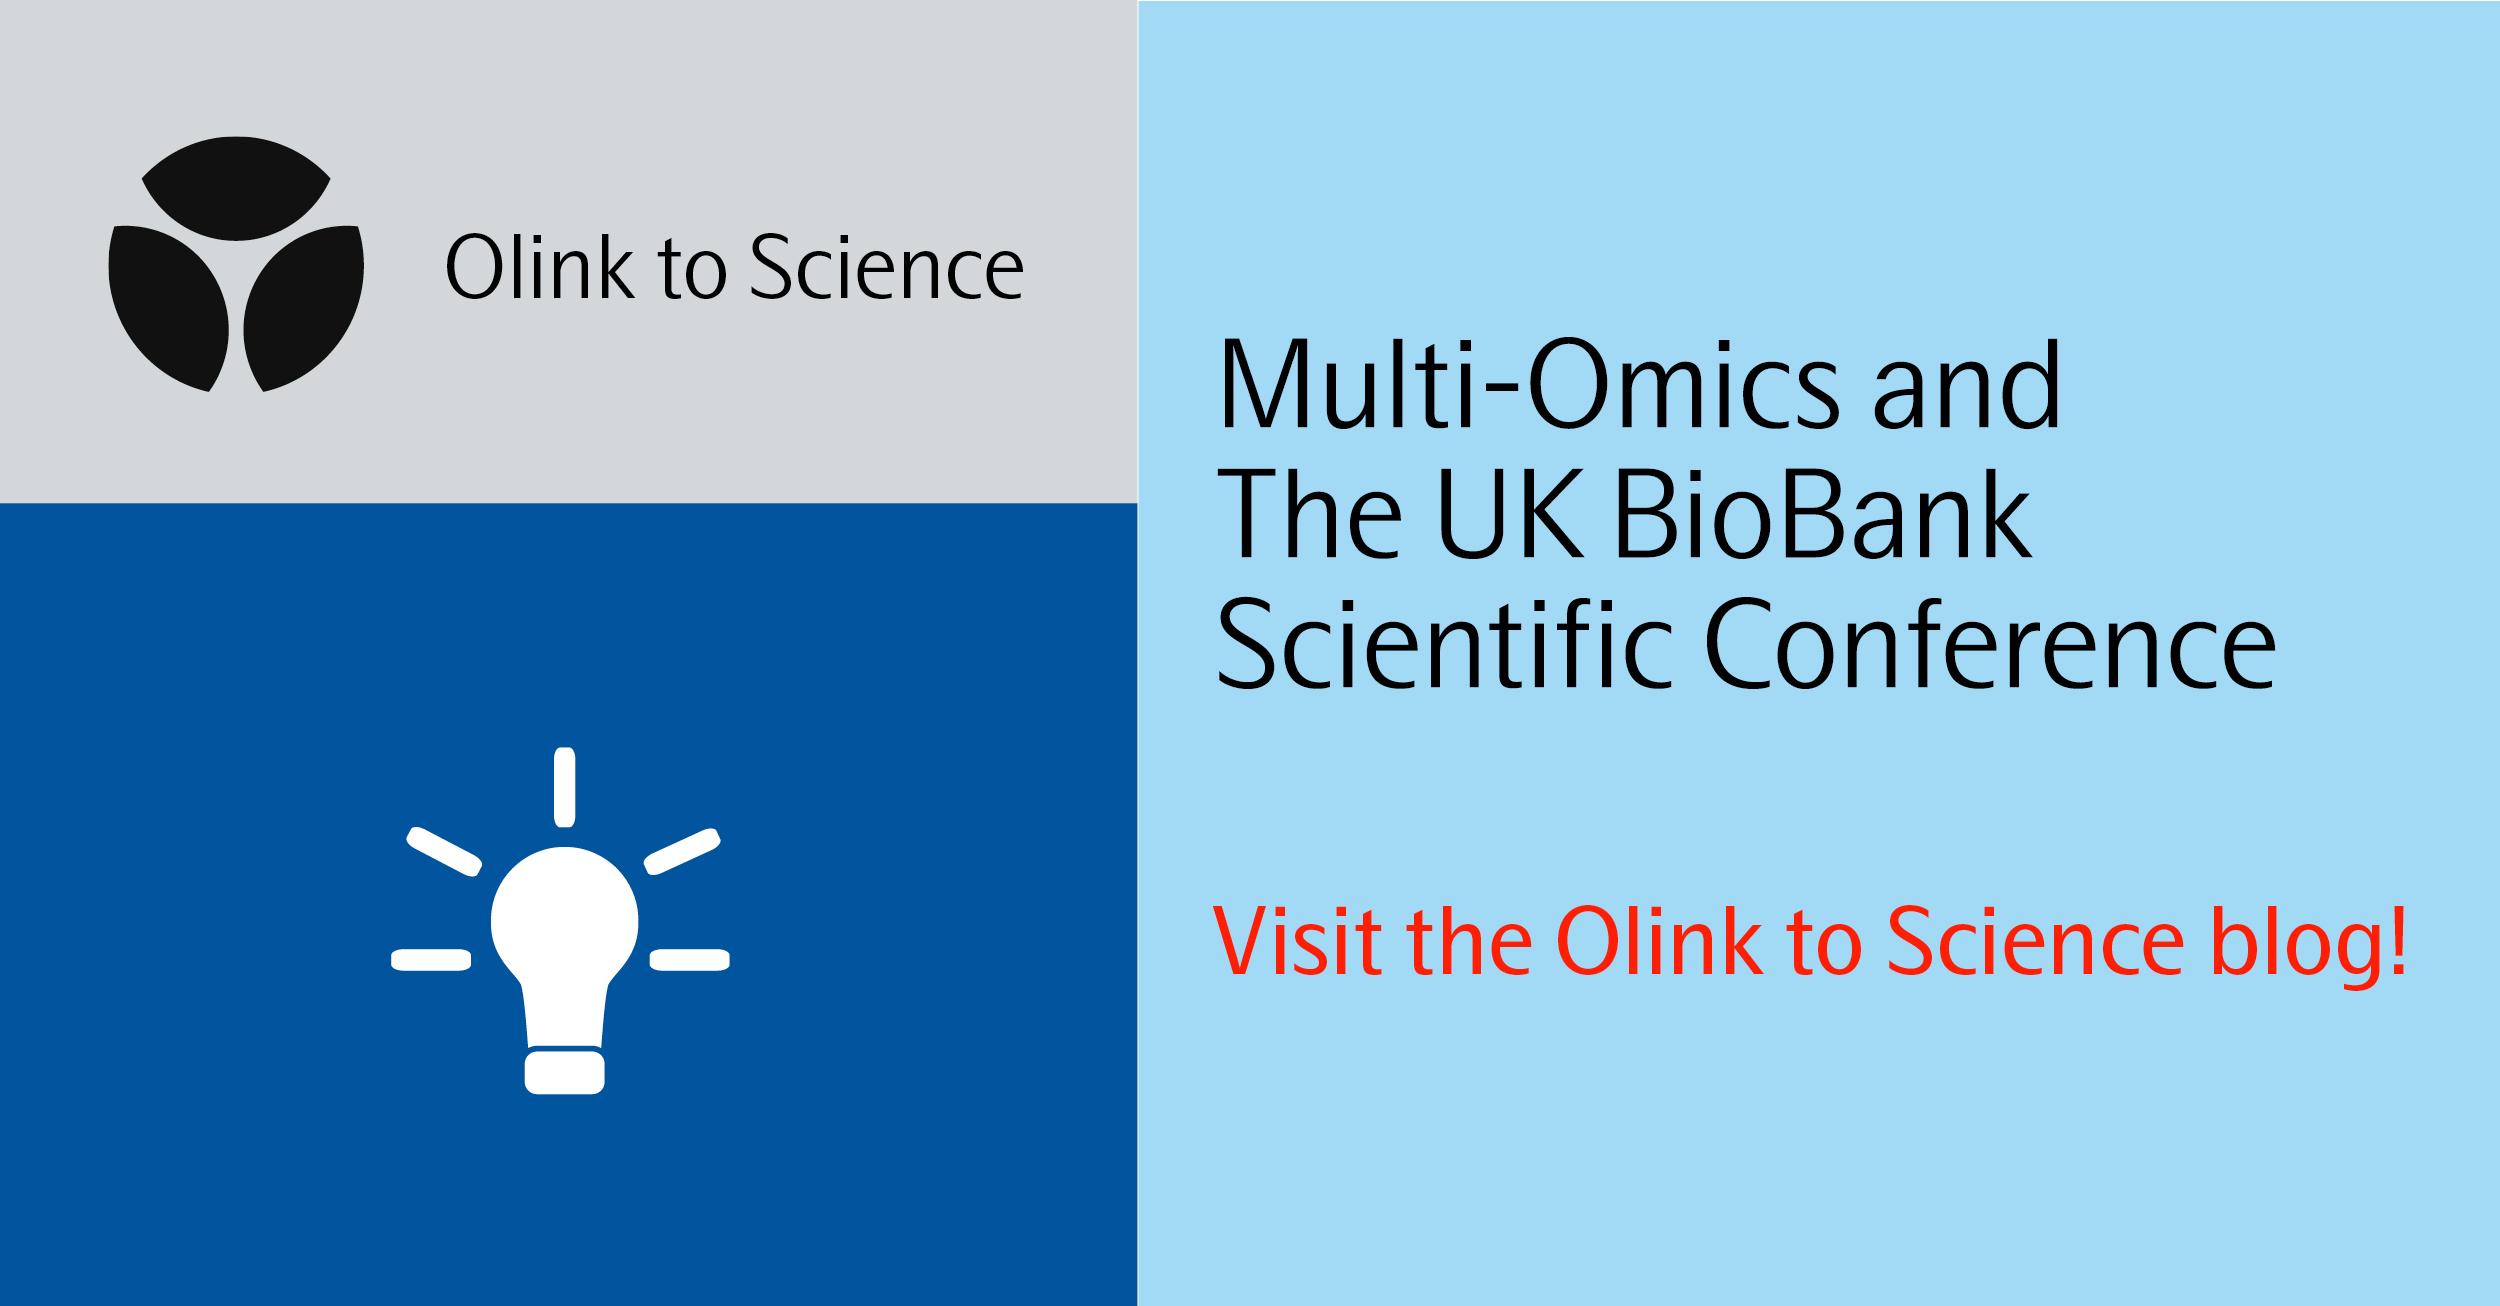 03 Multi-Omics and The UK BioBank Scientific Conference